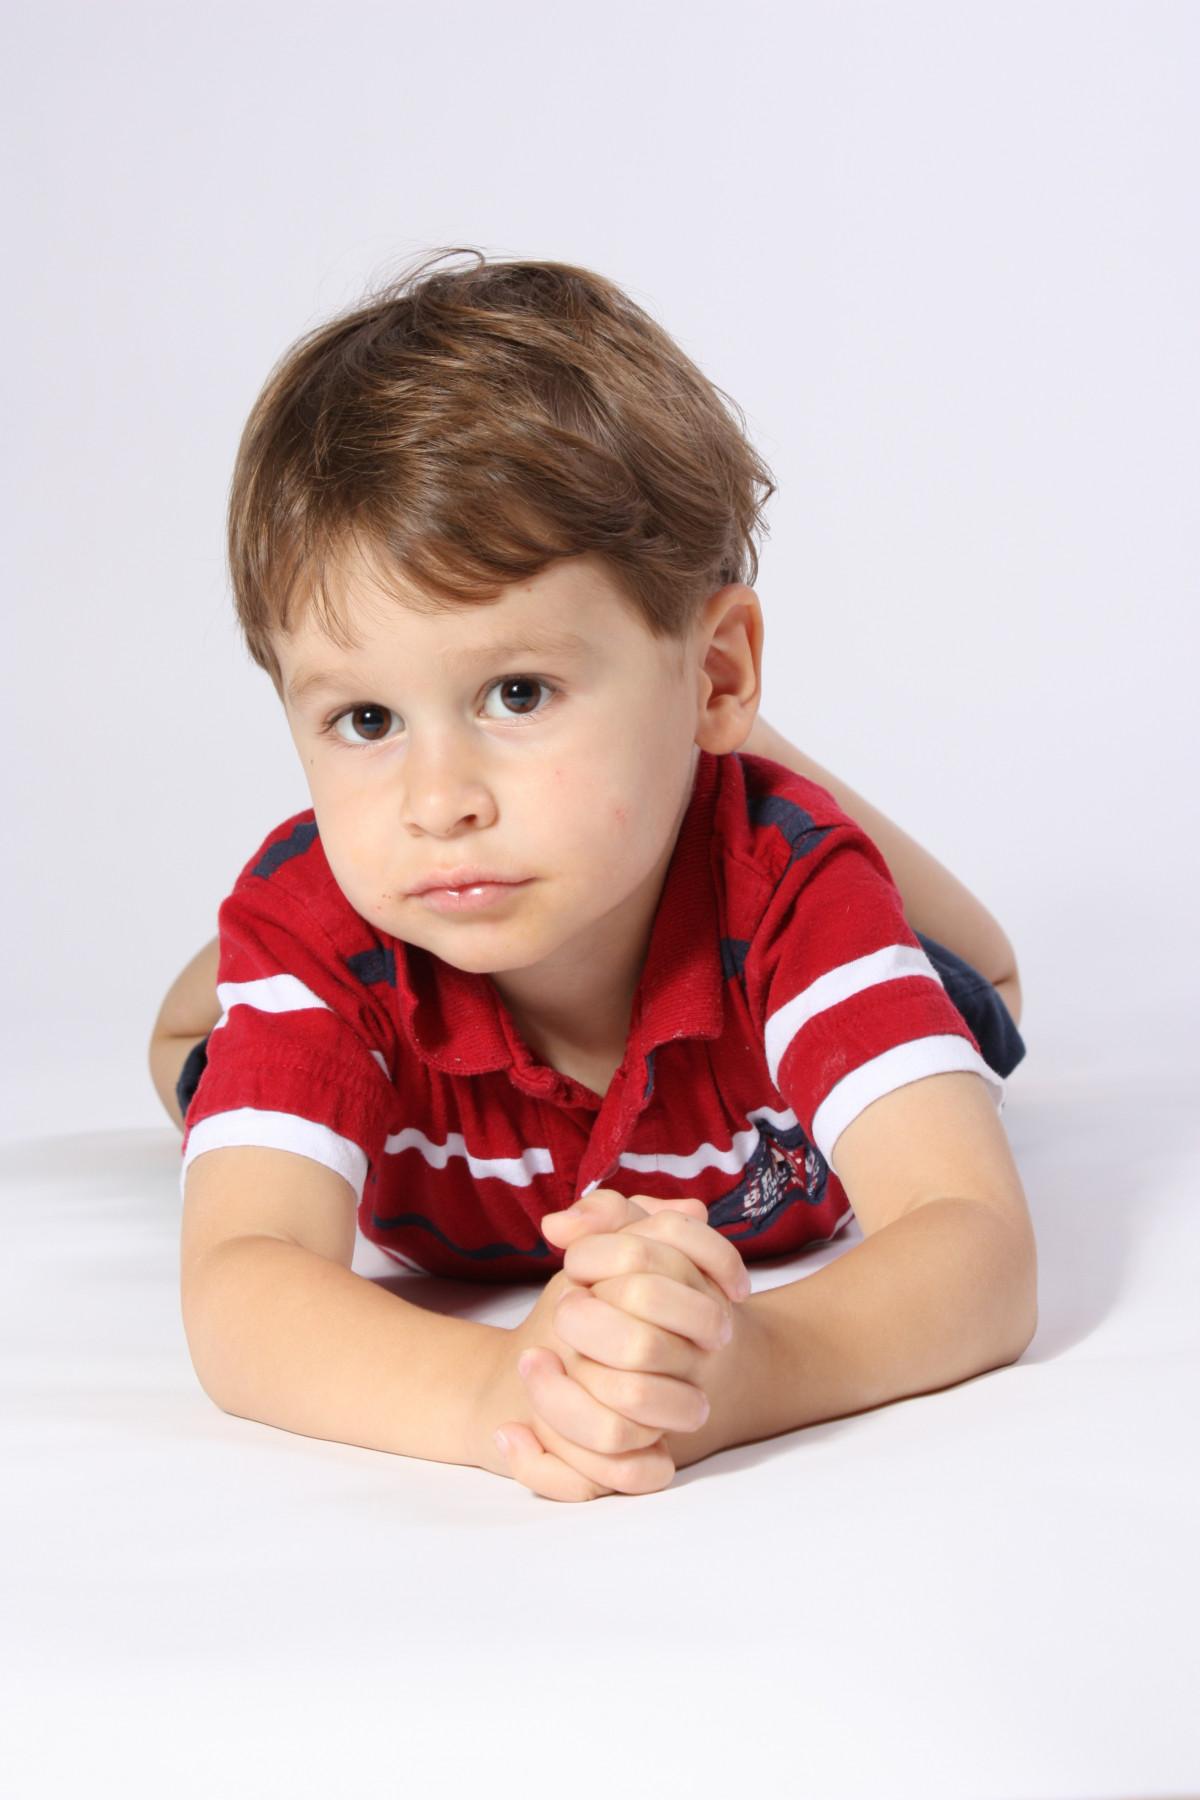 Toddler Boy Long Blonde Hair Surfer: Free Images : Dorable, Baby, Blur, Boy, Child, Close Up